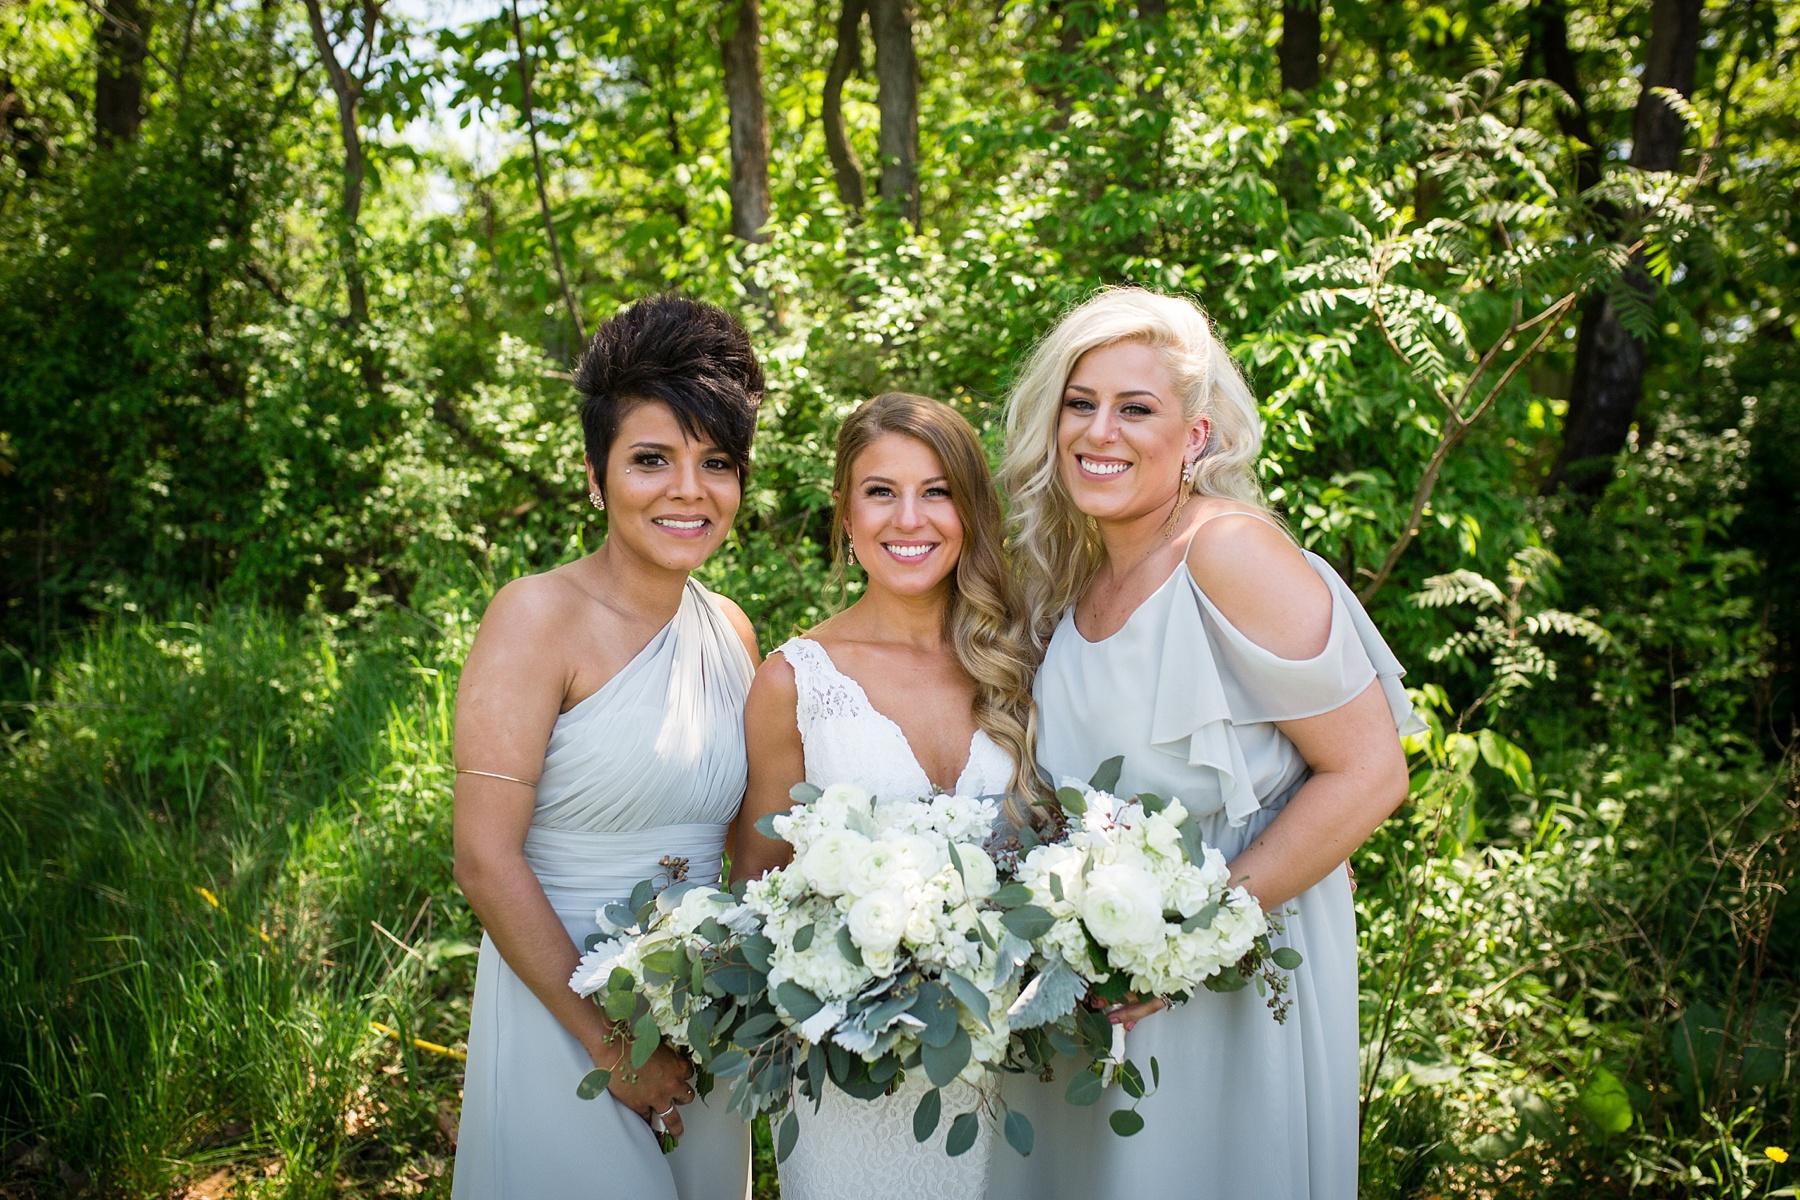 Brandon_Shafer_Photography_Kara_Doug_12_corners_Wedding_Benton_Harbor_0030.jpg